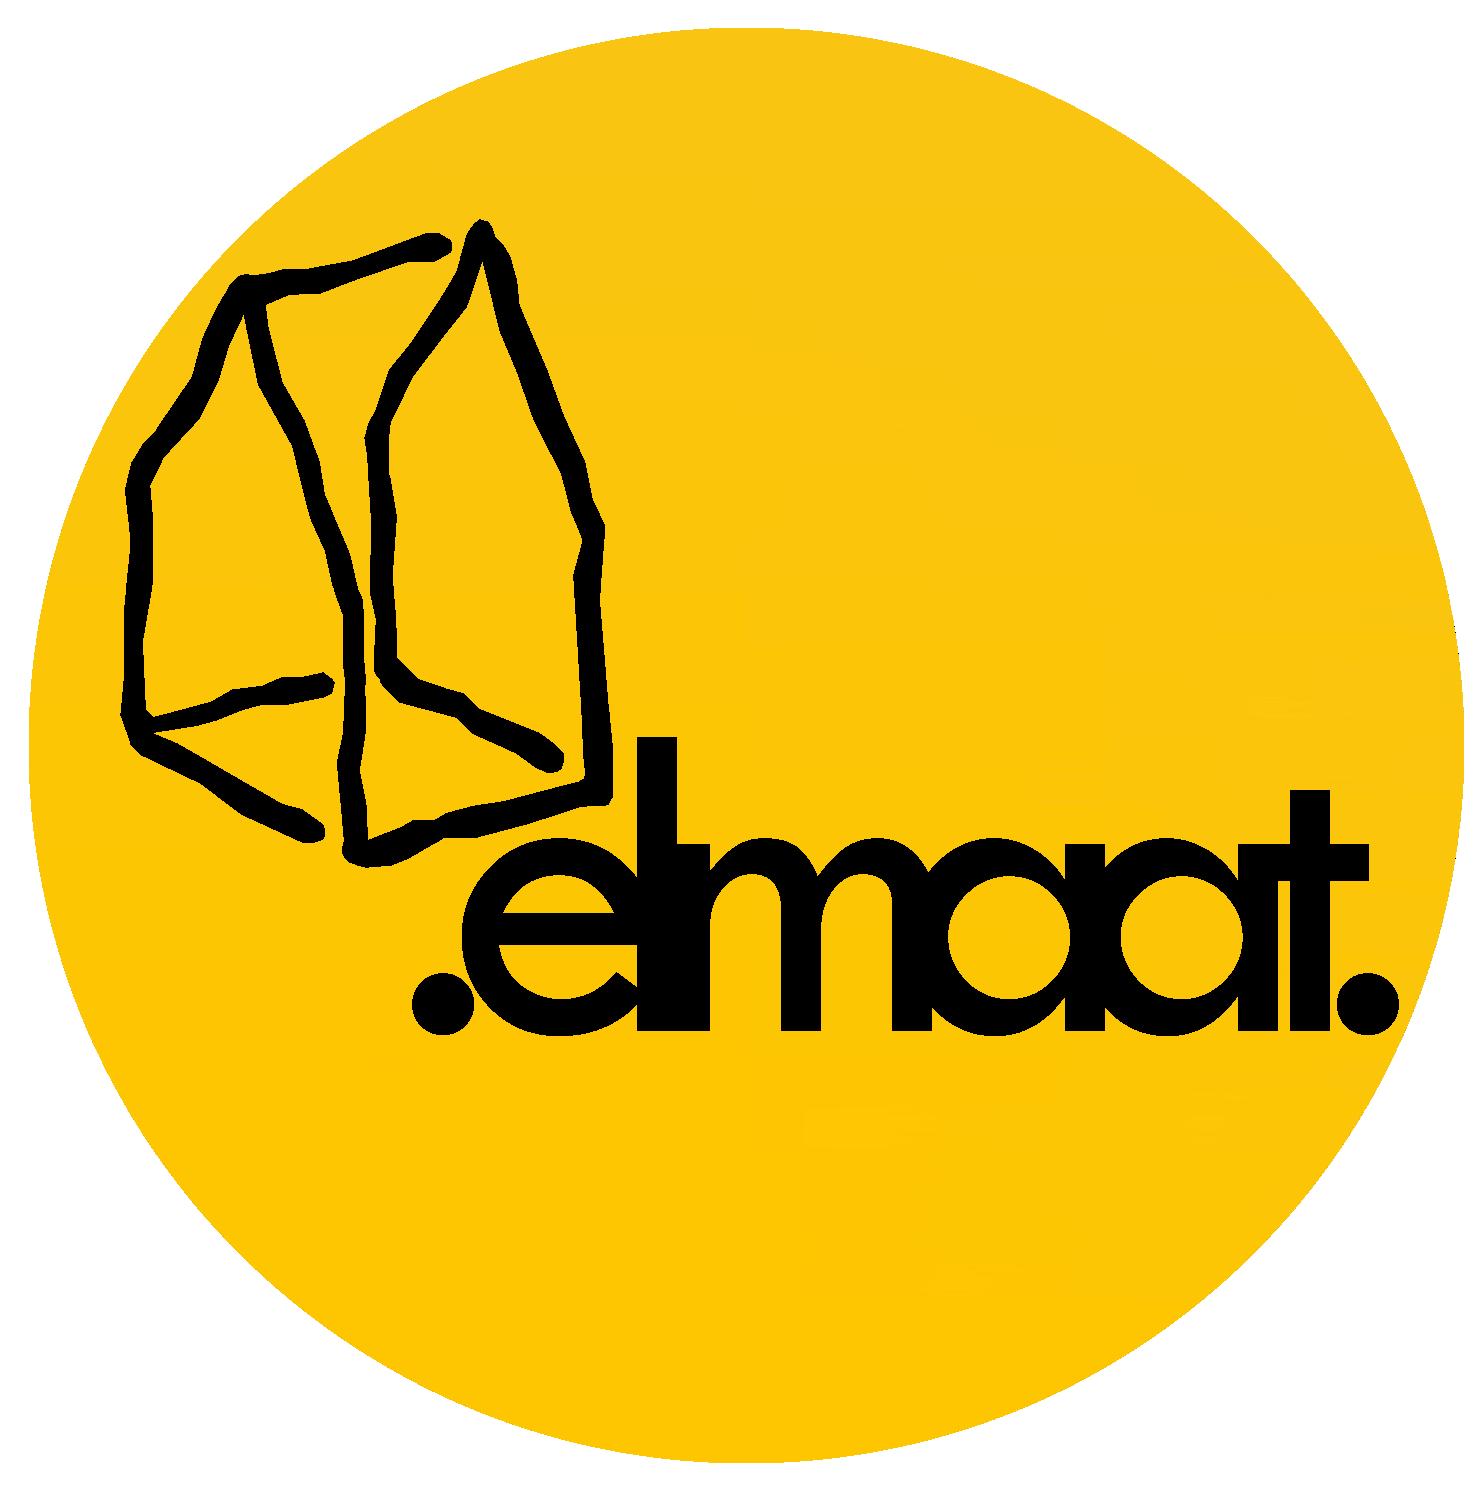 ELMAAT.NL